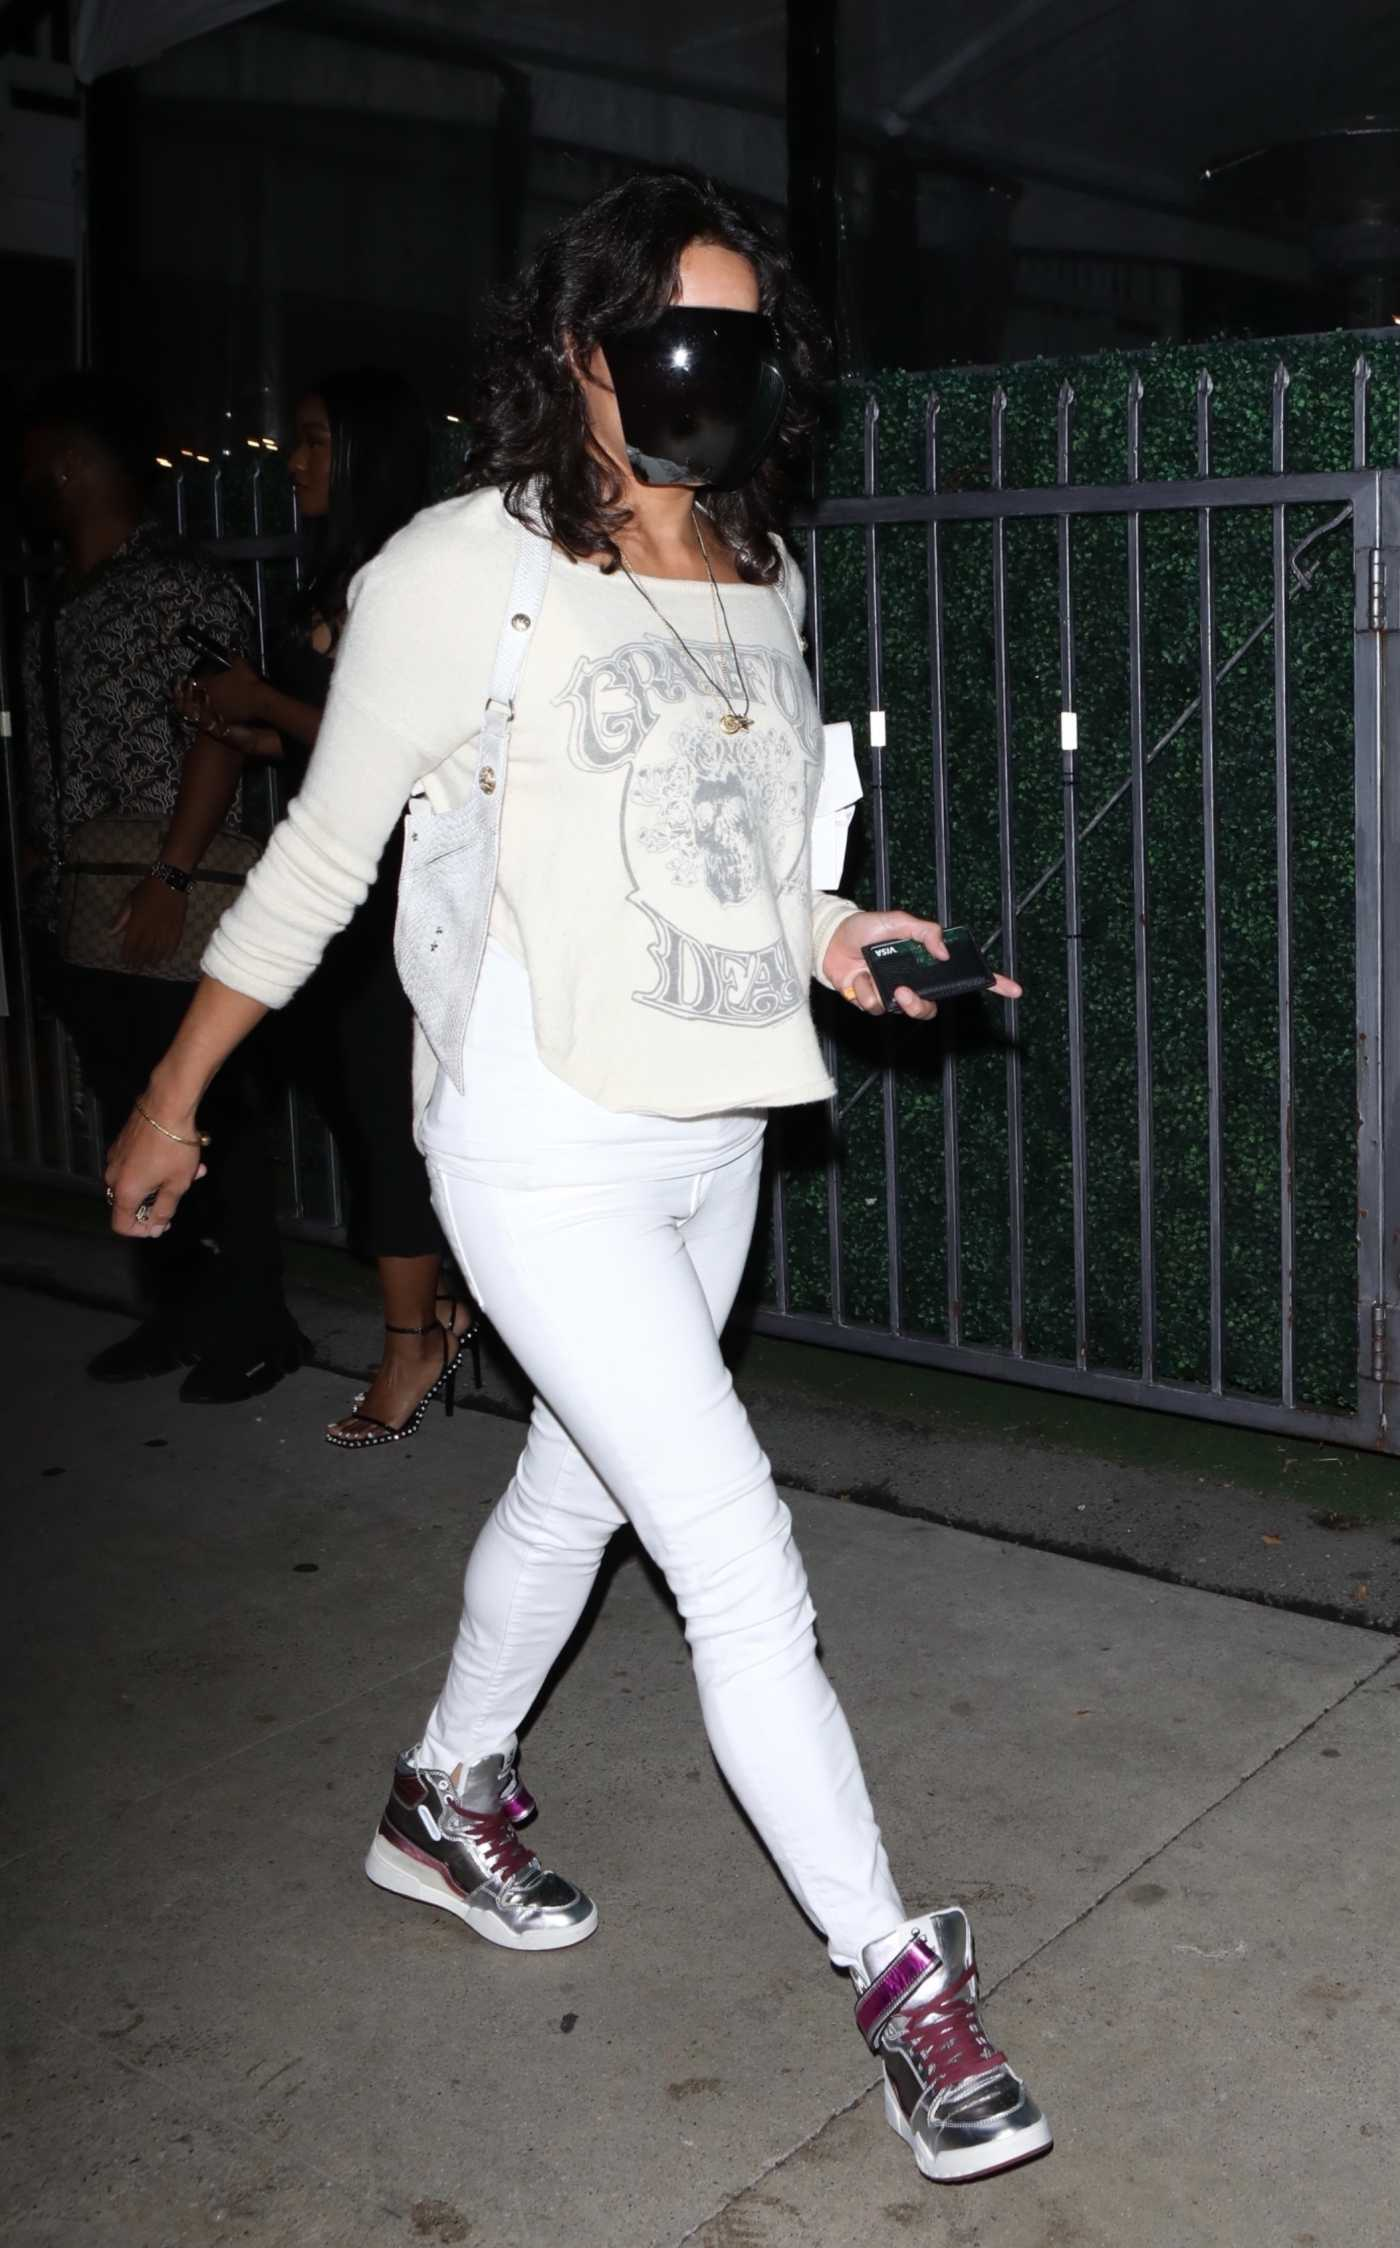 Michelle Rodriguez in a Black Protective Mask Leaves Dinner at Giorgio Baldi in Santa Monica 10/21/2021